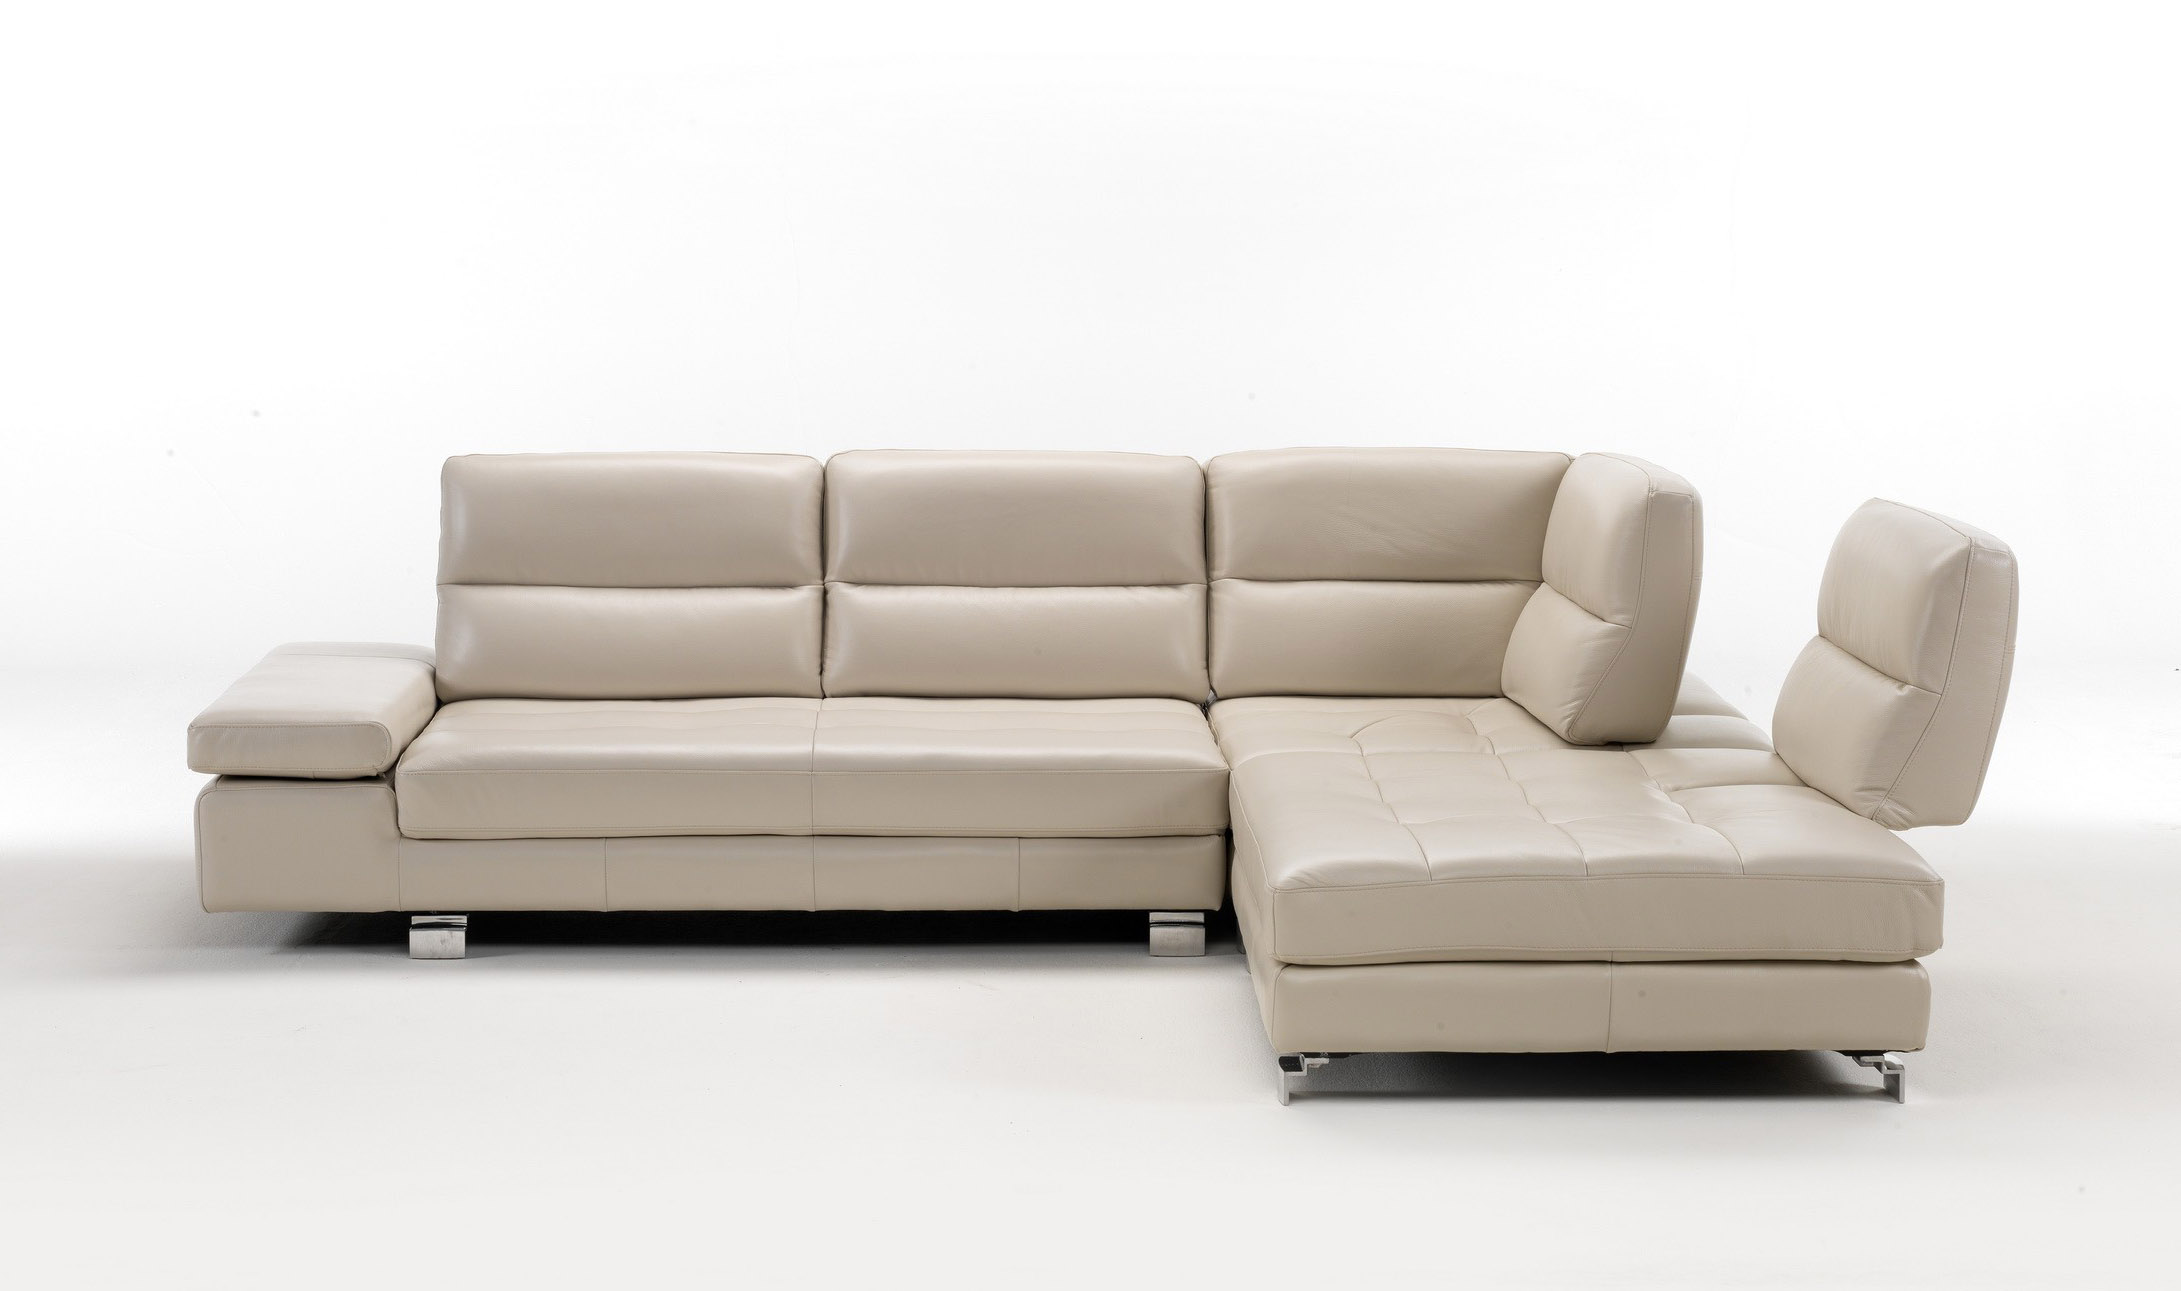 Amazing leather sectional sofa portland oregon sectional for Sectional sofa portland oregon